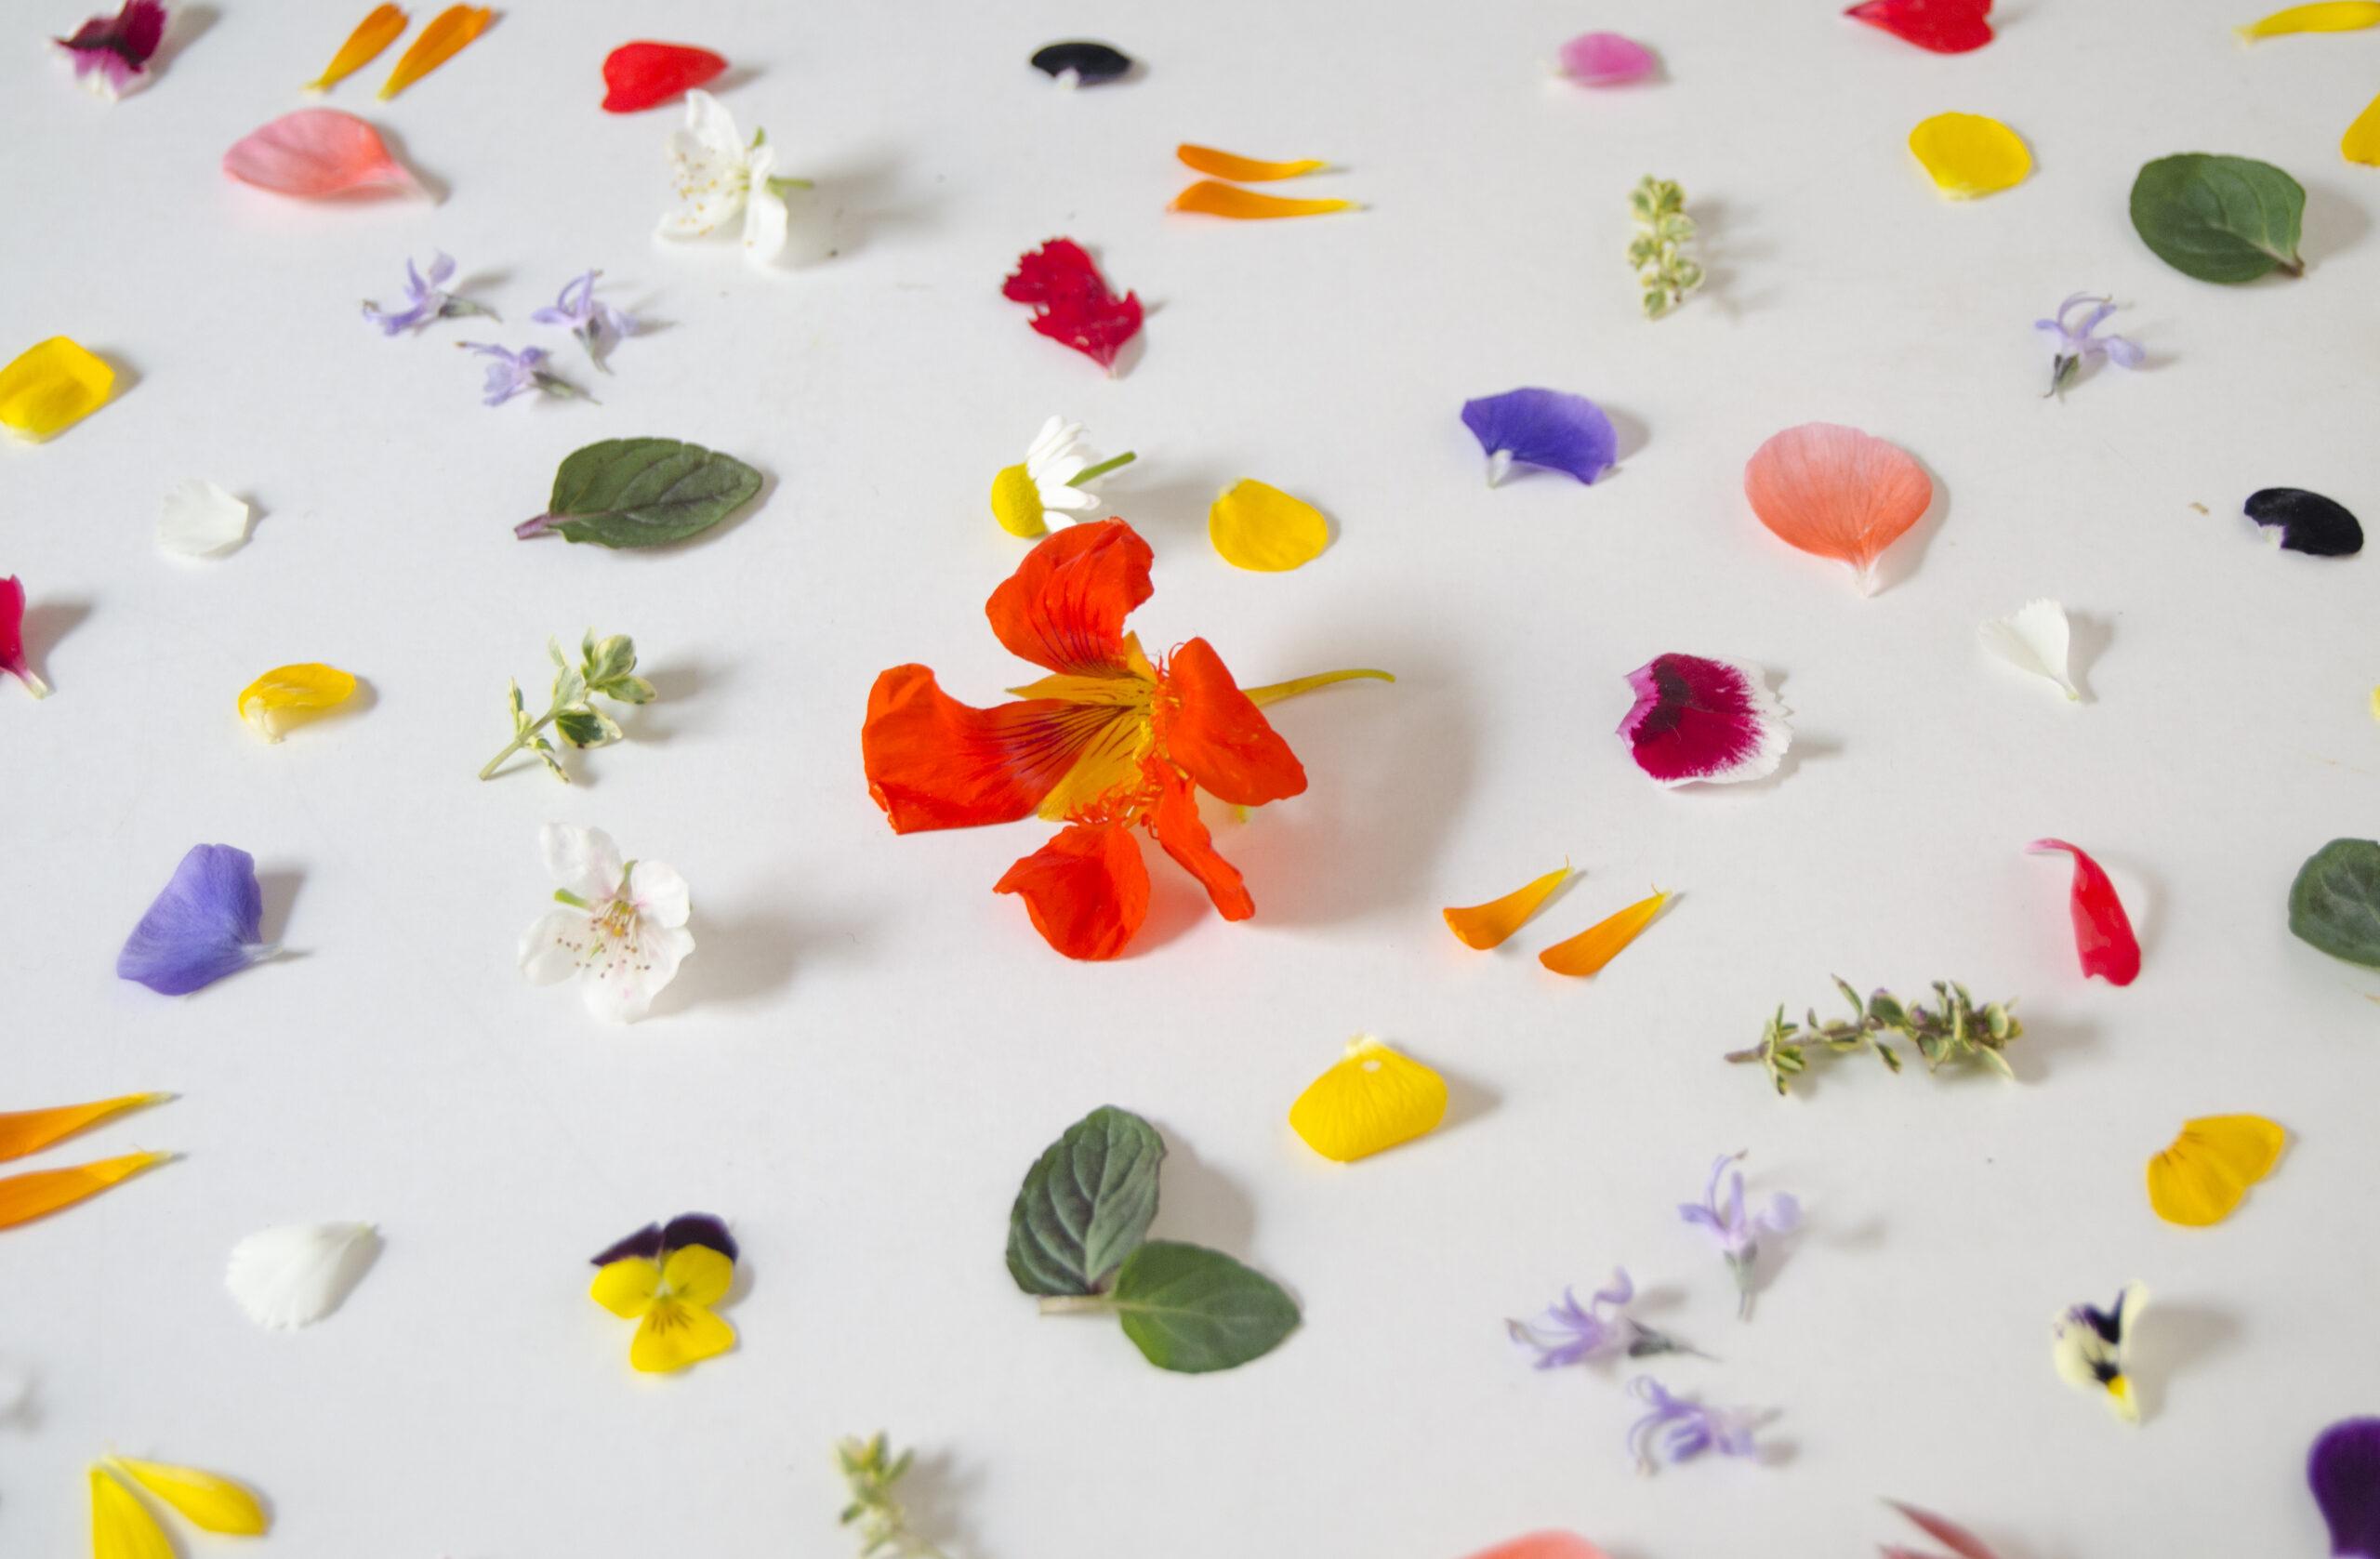 Lista de flores comestibles